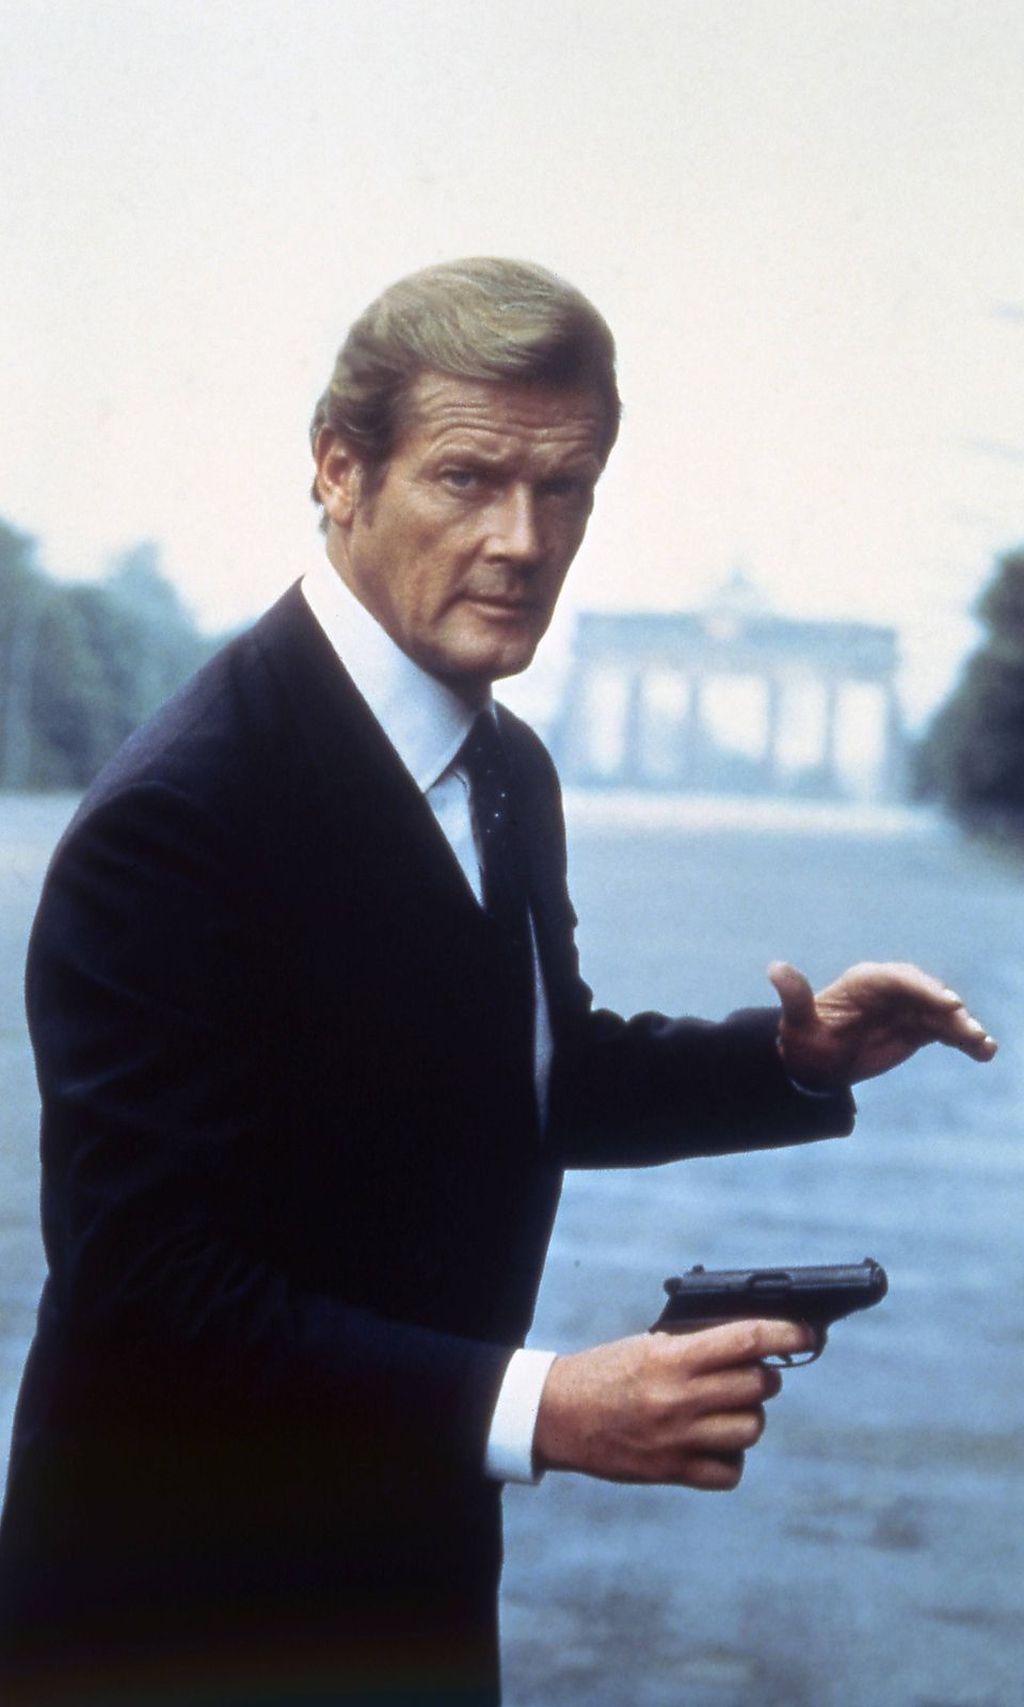 James Bond Sean Connery Wird 87 Diepressecom